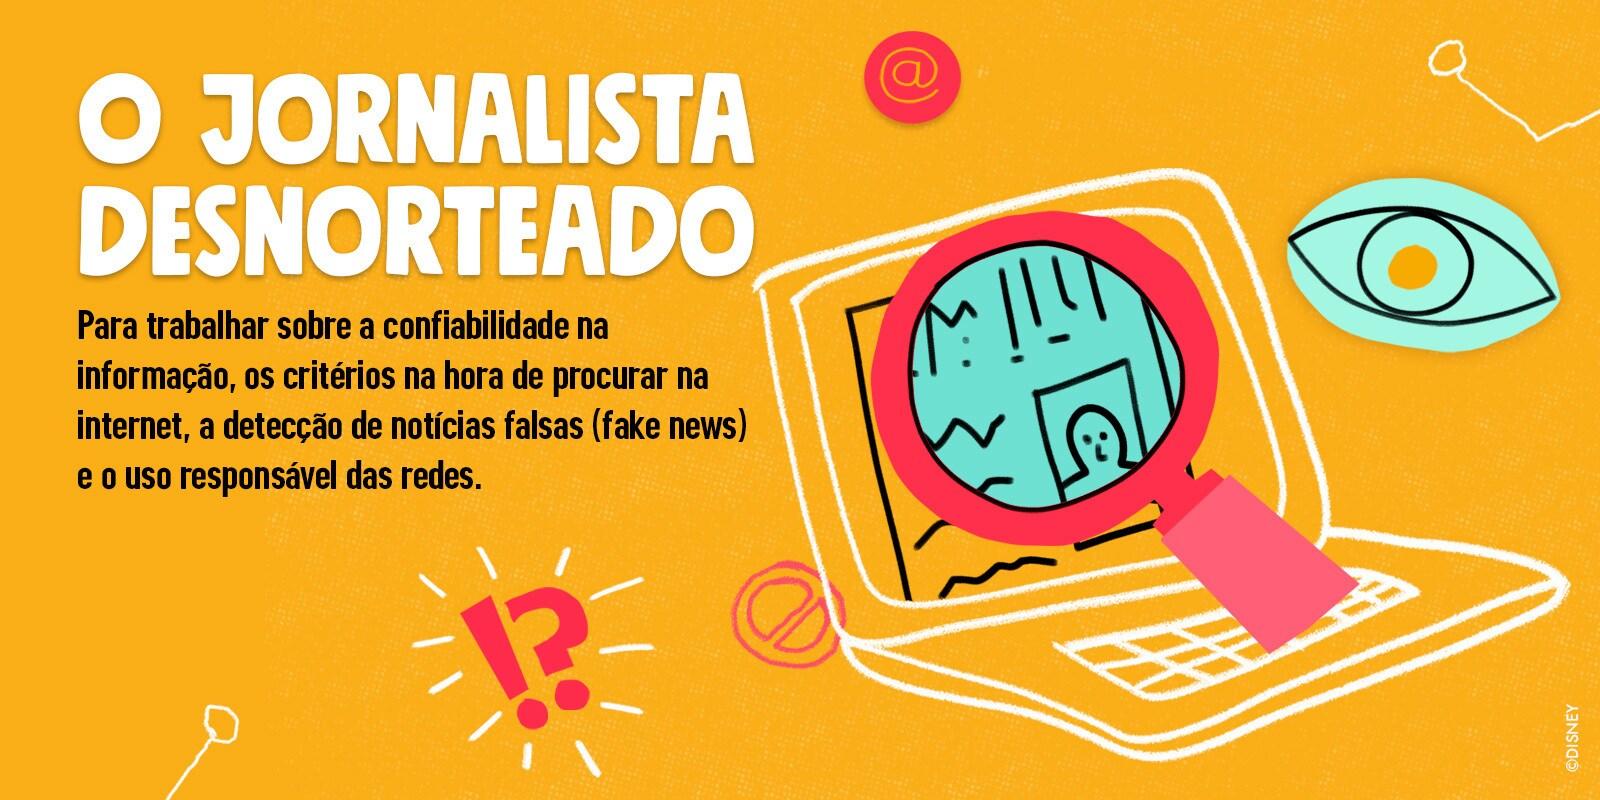 Acceso_PDF_TinkerLab_PeriodistaDespistado